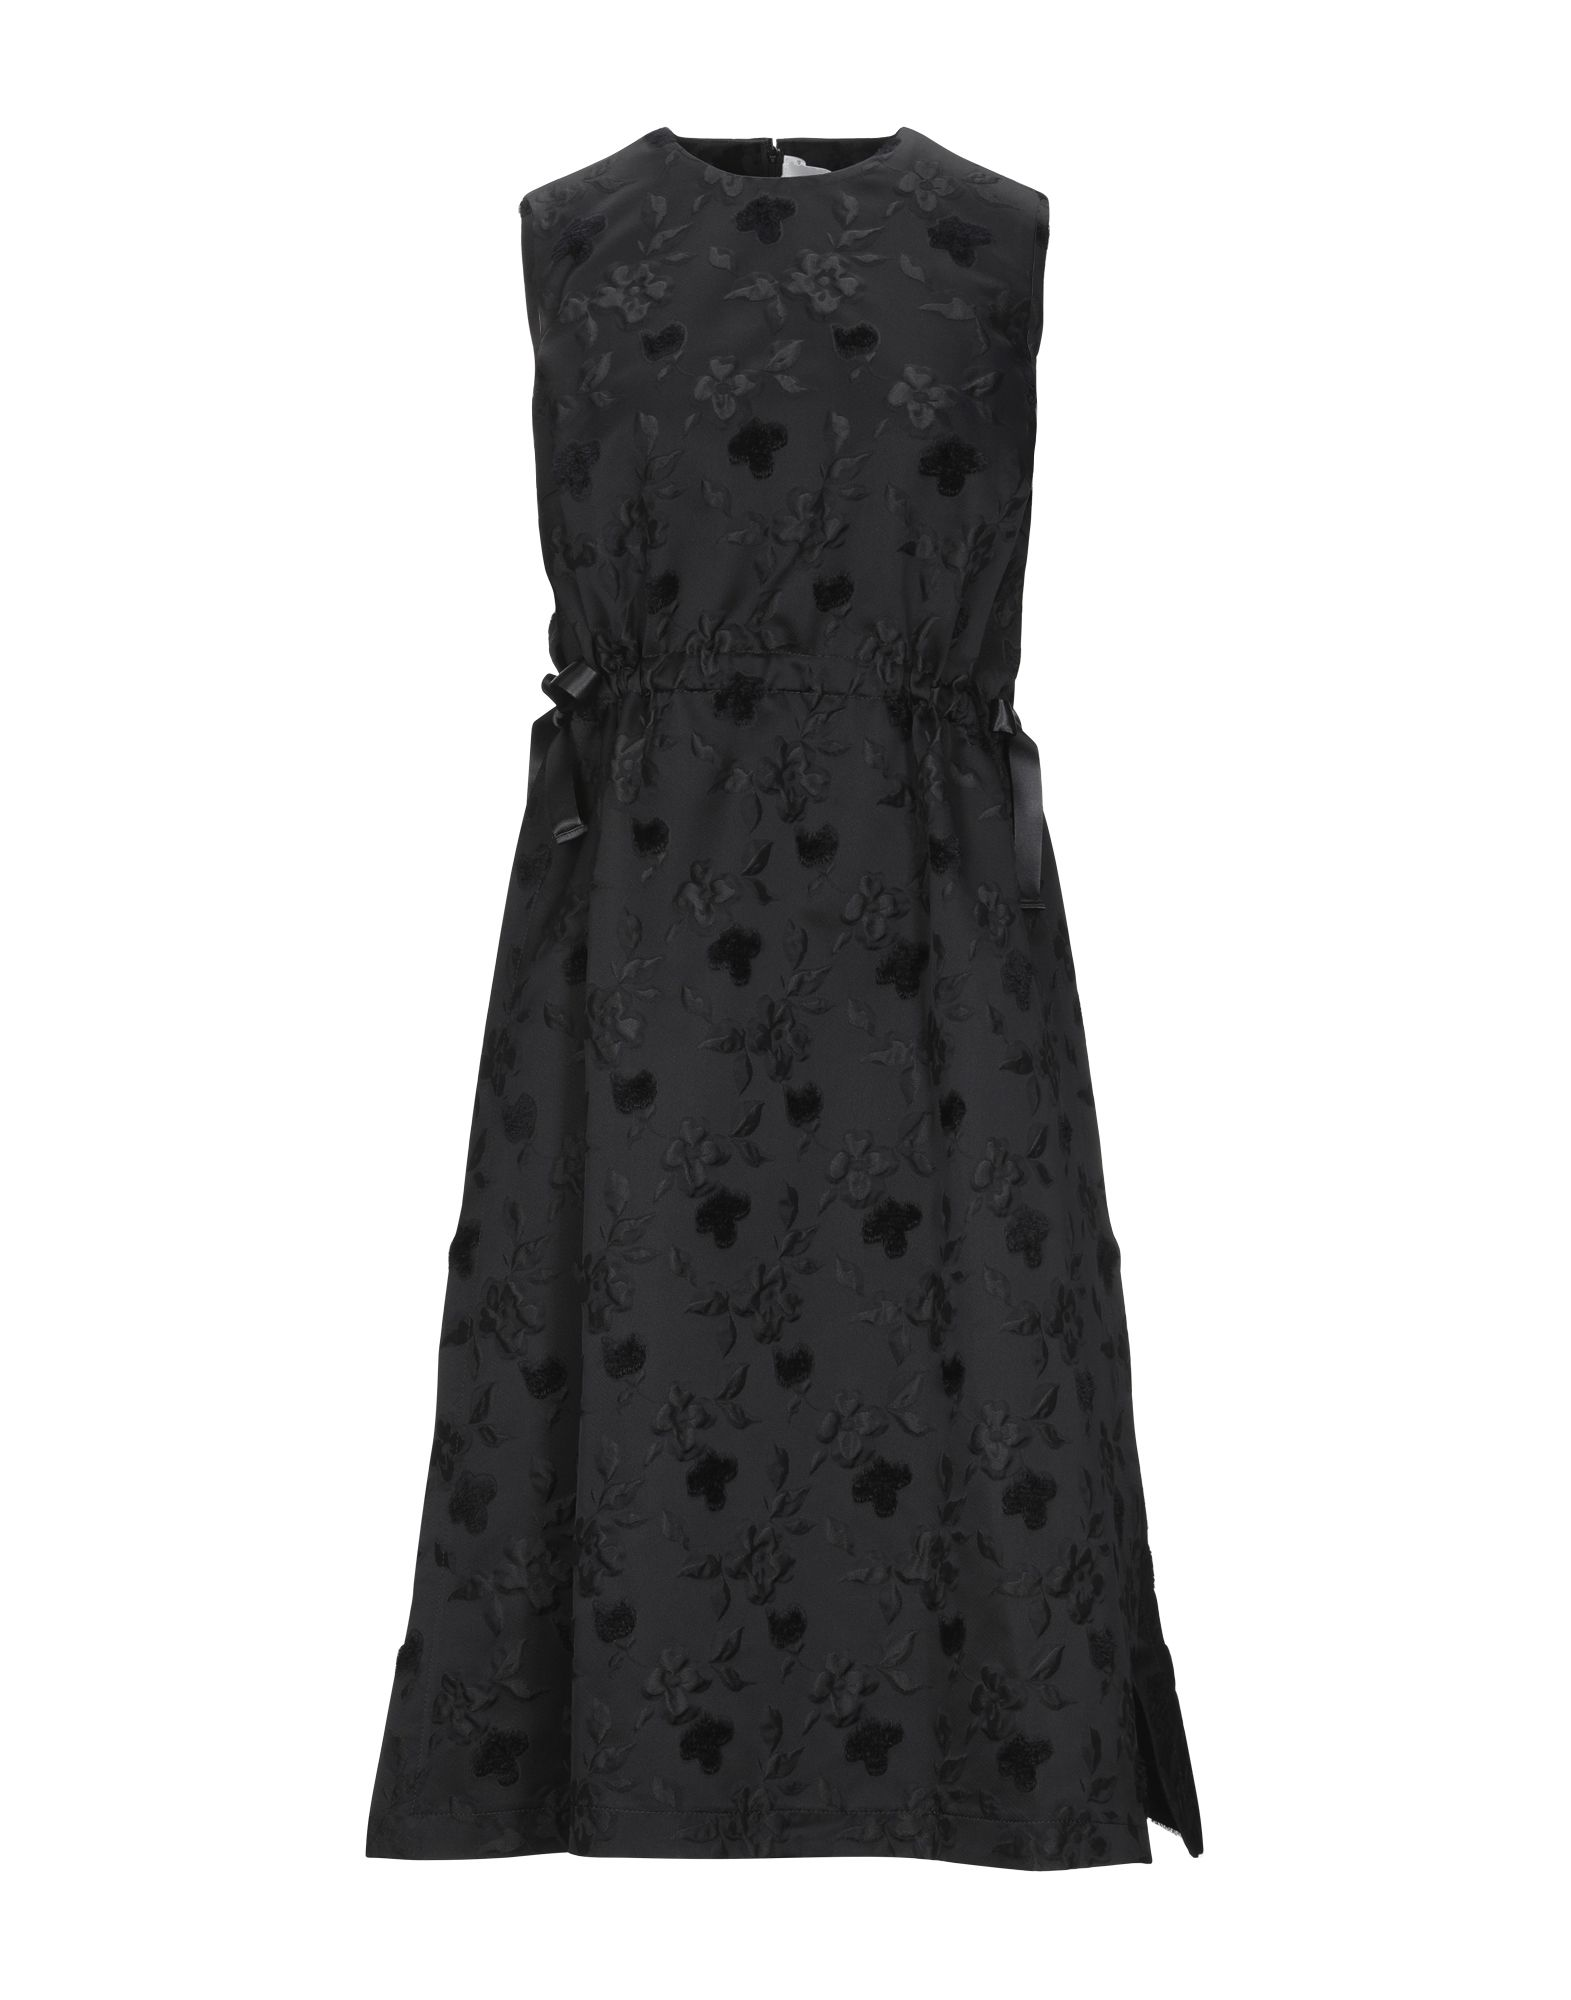 Фото - NOIR KEI NINOMIYA Платье длиной 3/4 noir kei ninomiya платье до колена